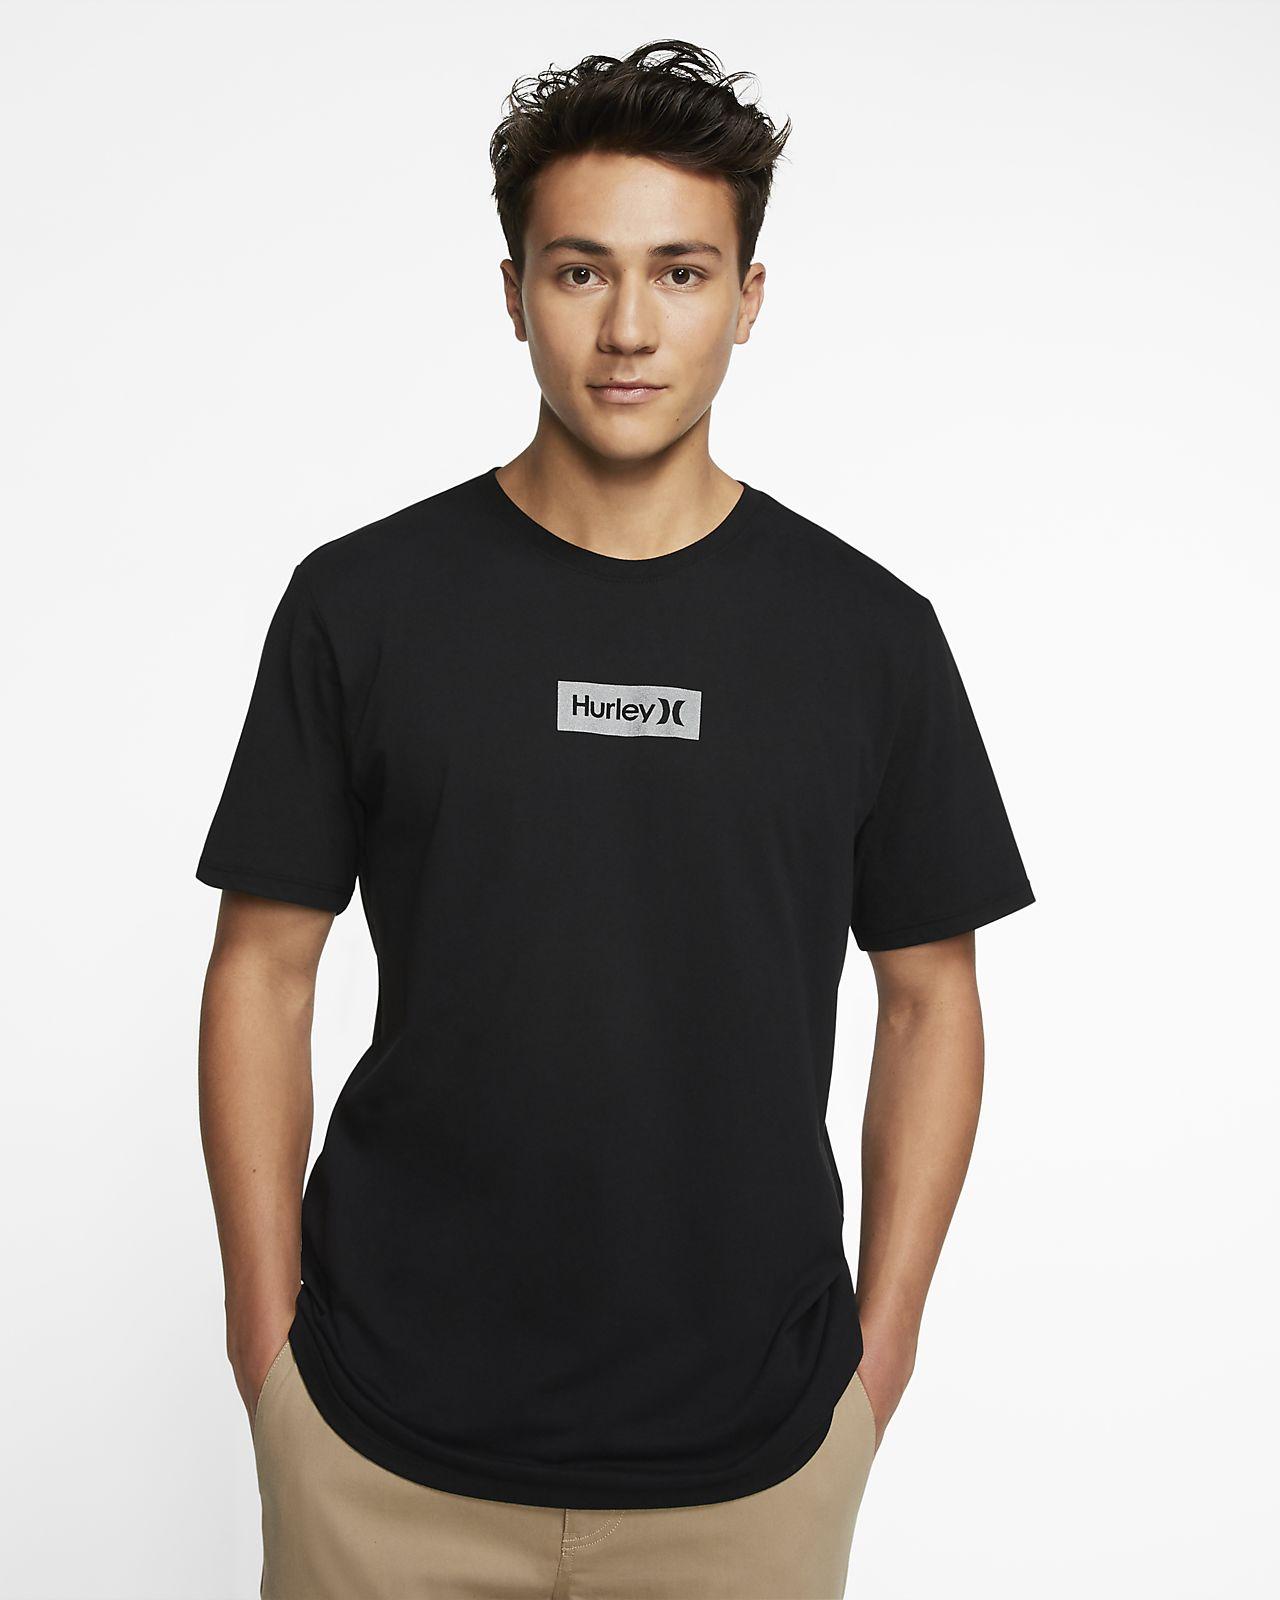 T-shirt Hurley Dri-FIT One And Only Small Box för män